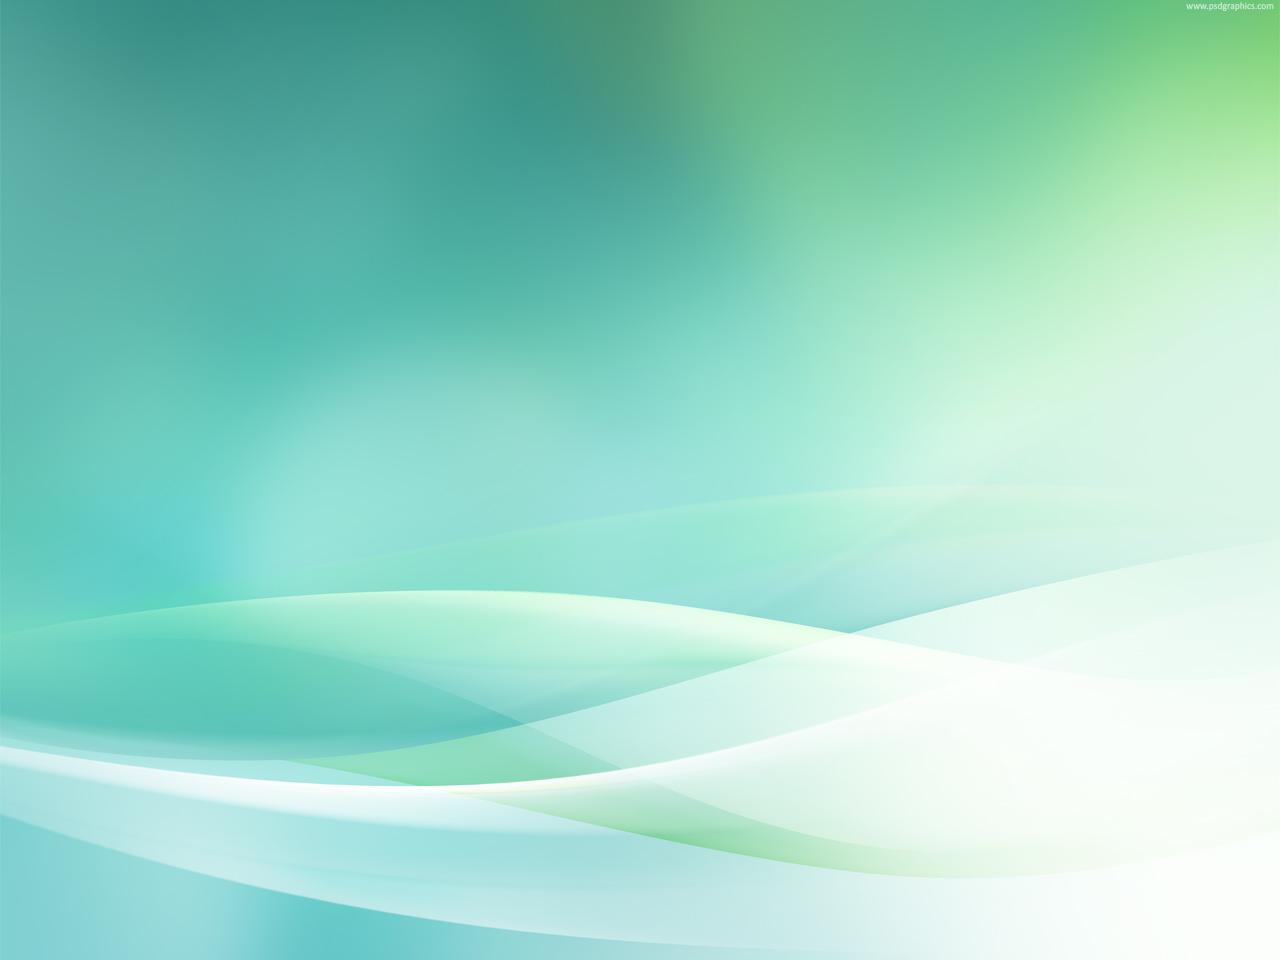 Fresh green background PSDGraphics 1280x960